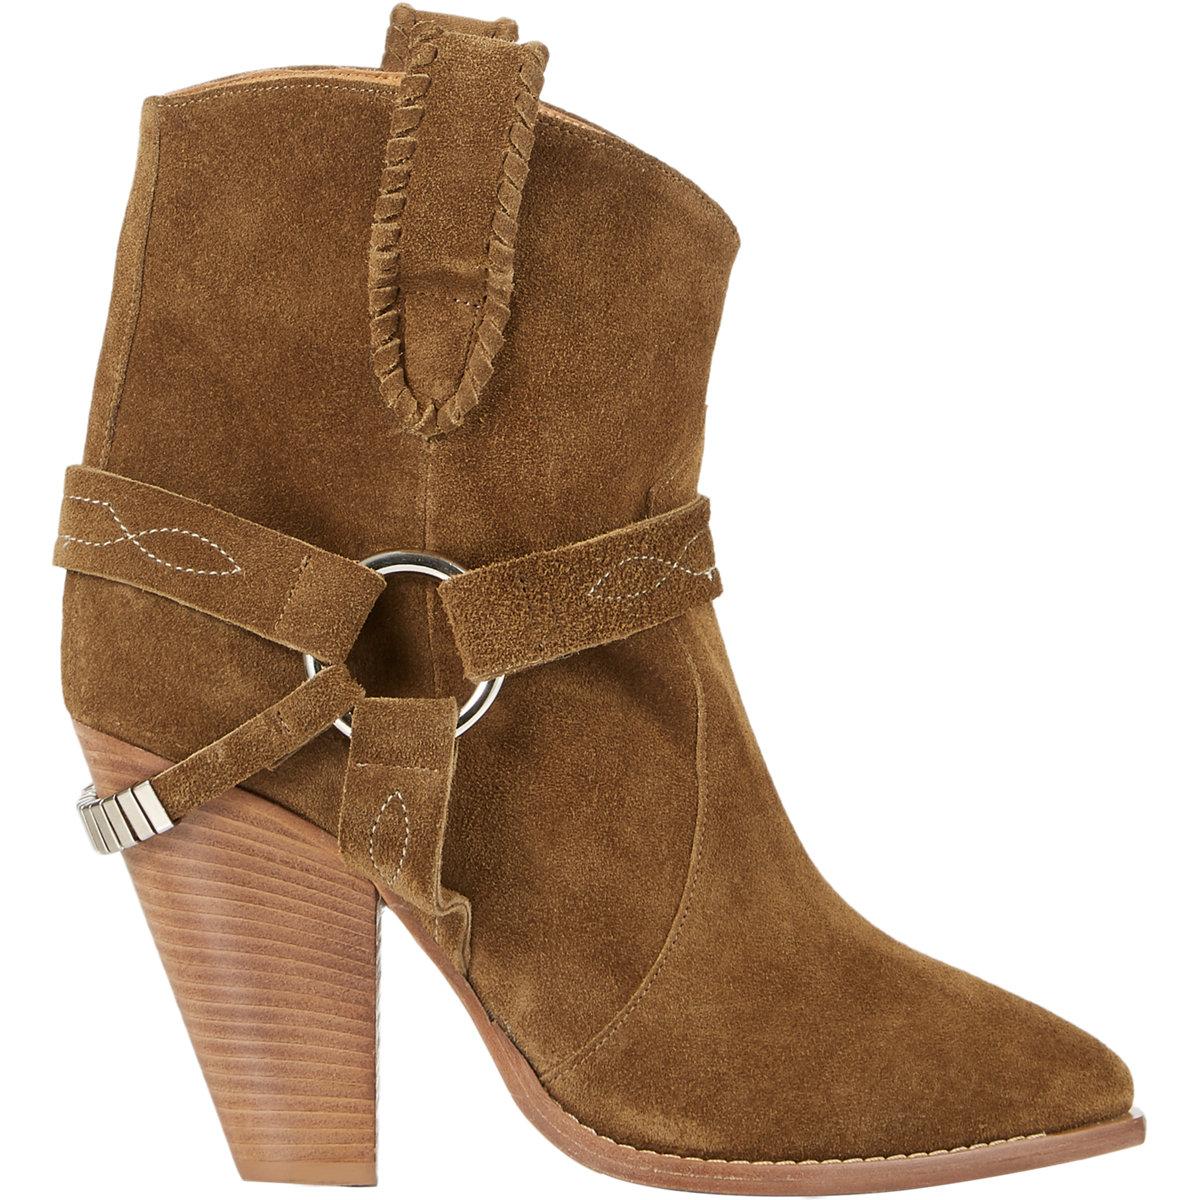 8a2e3dfd115a isabel-marant-etoile-toast-rawson-harness-boots -khaki-product-3-592971940-normal.jpeg